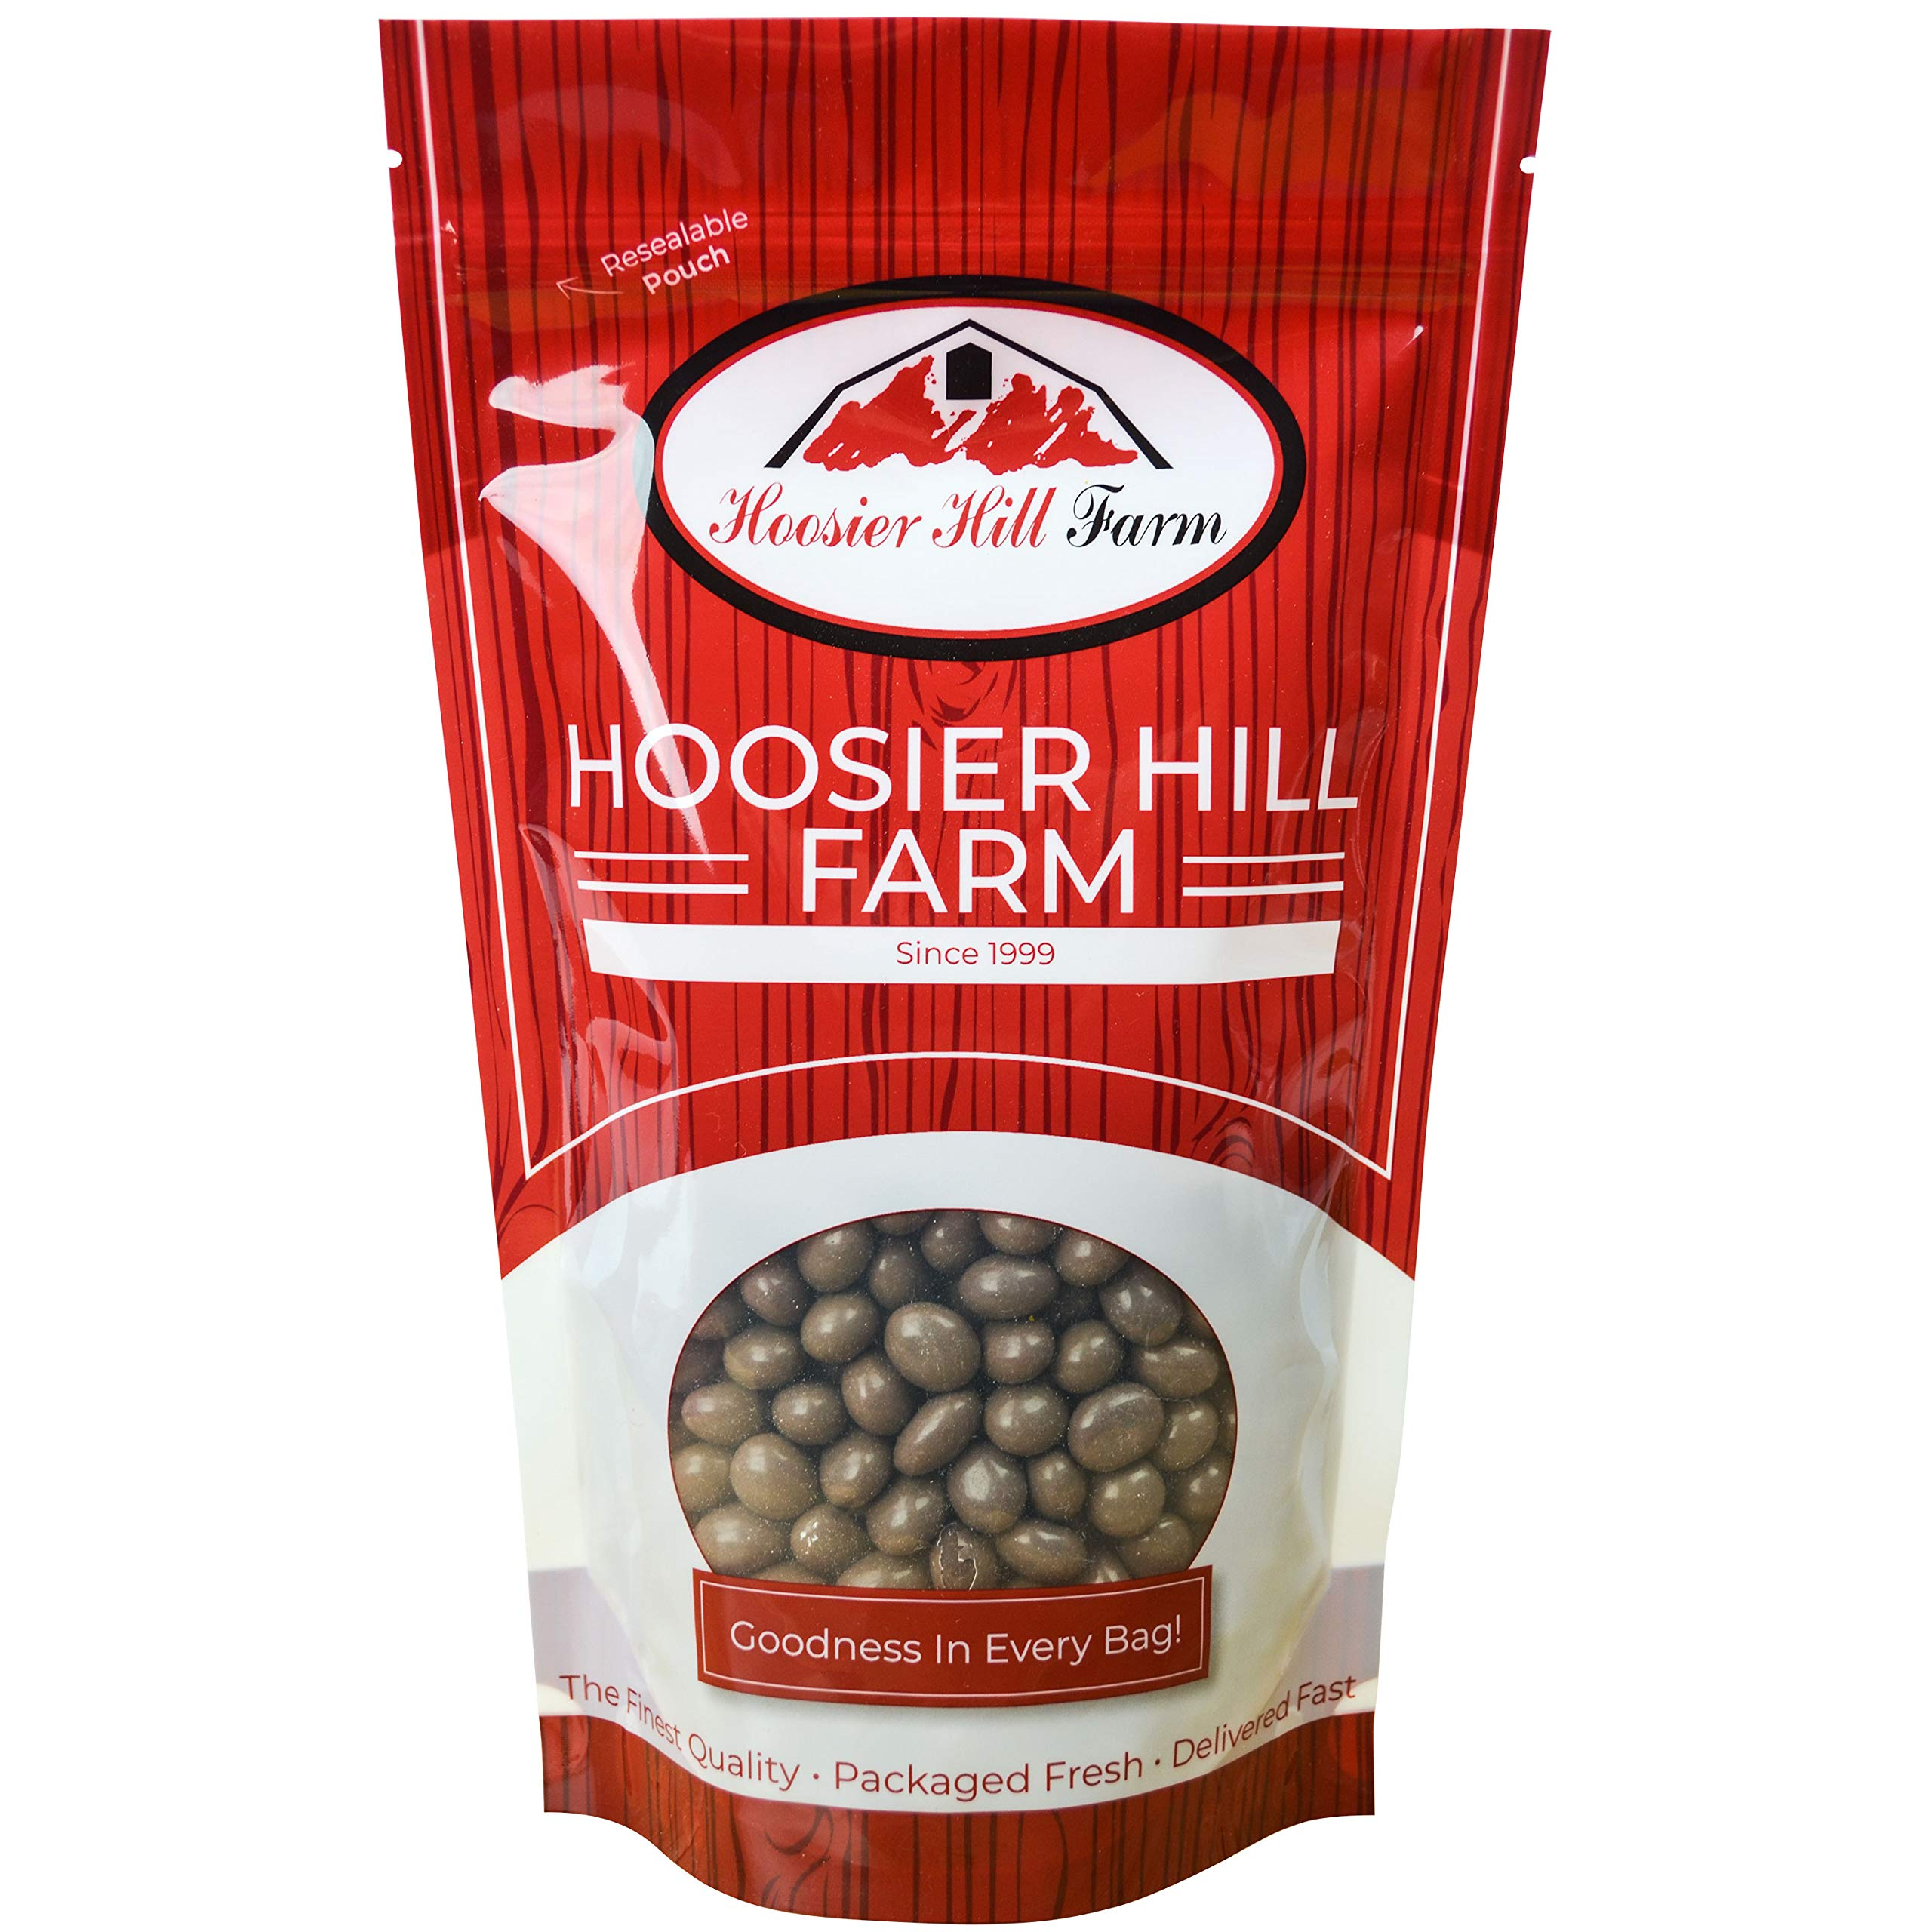 Hoosier Hill Farm Gourmet Milk Chocolate Covered Espresso Beans, 5 Pound by Hoosier Hill Farm